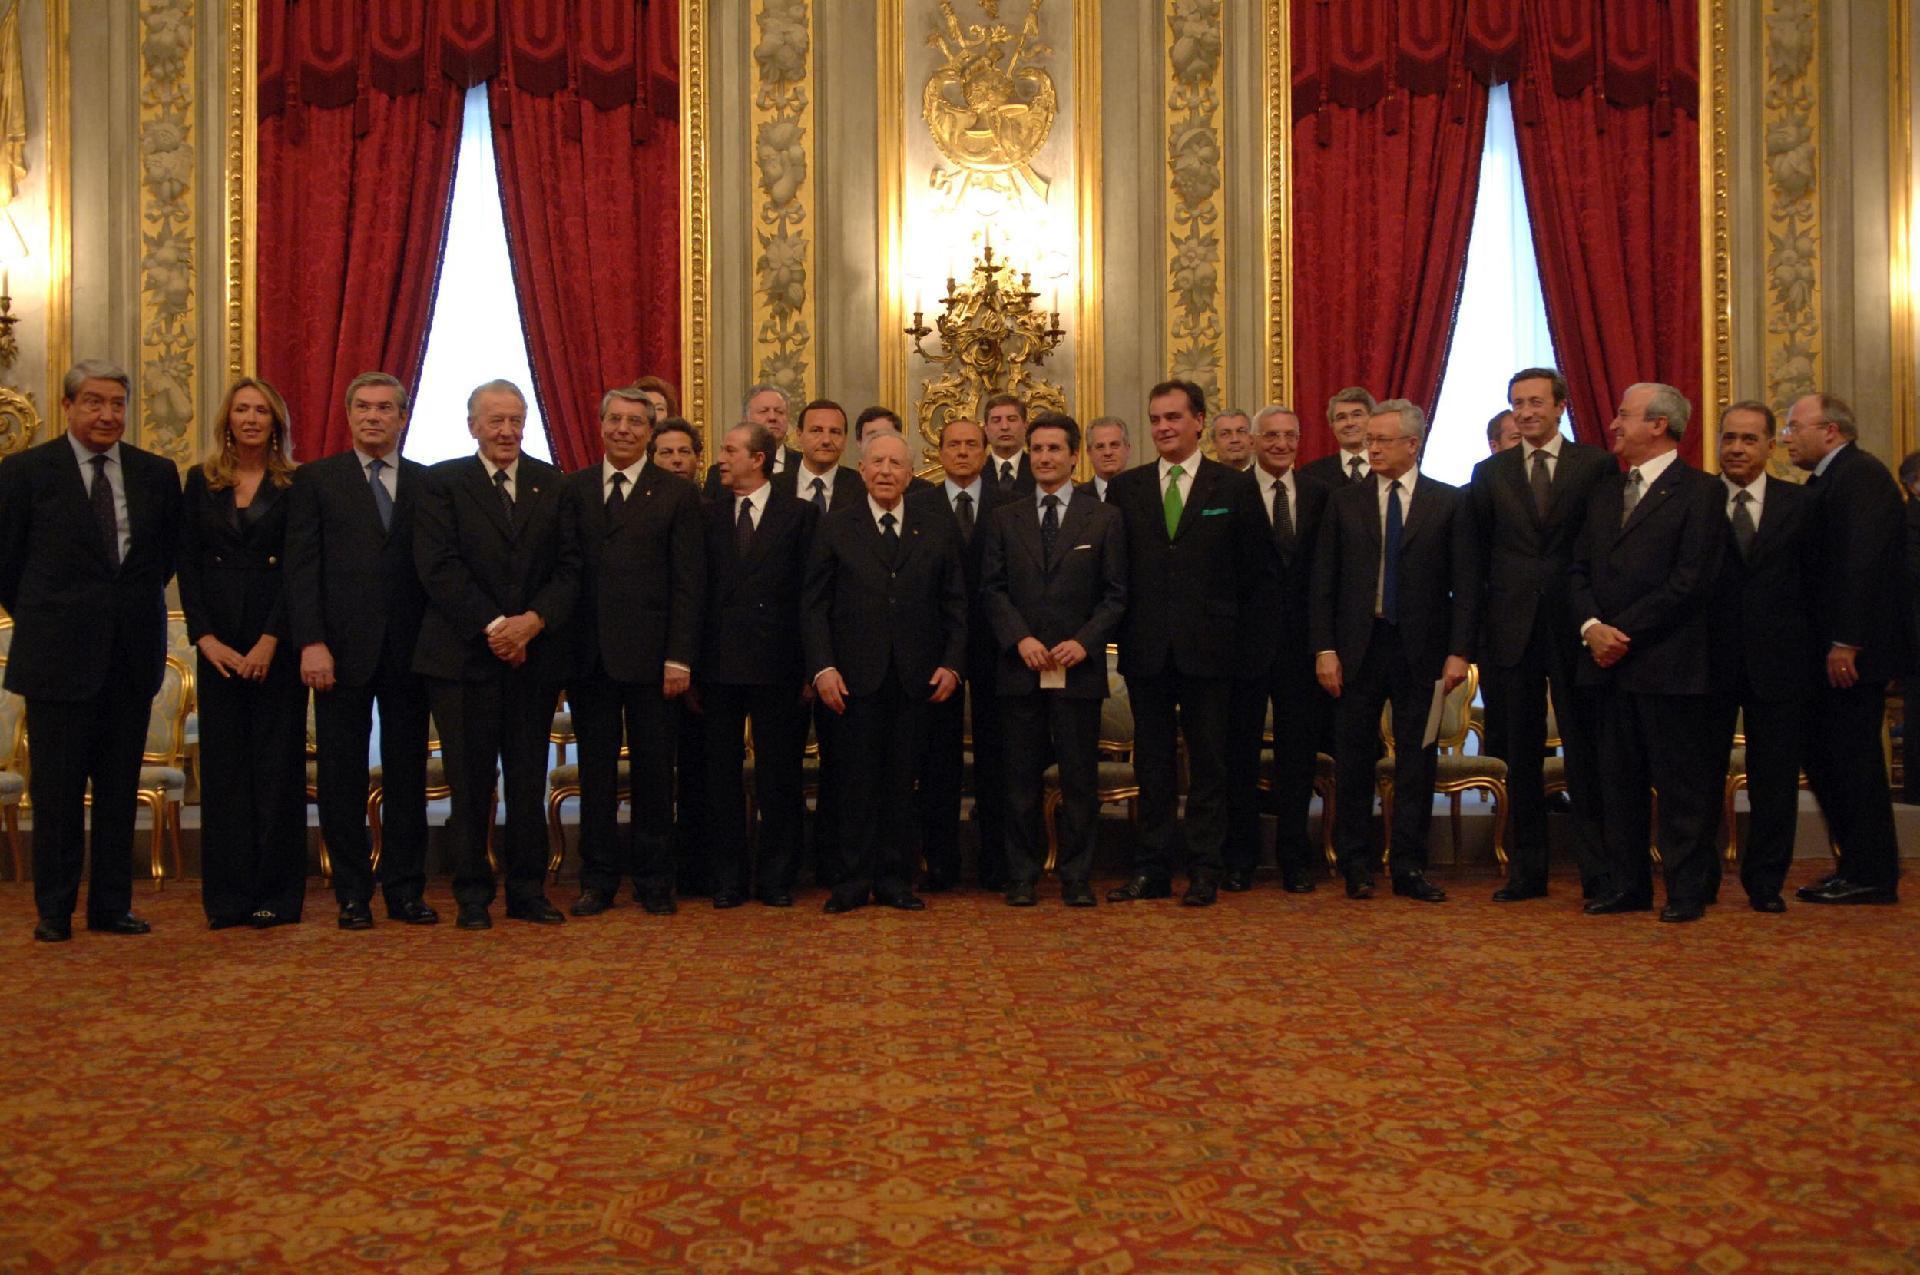 III Governo Berlusconi, 23 aprile 2005